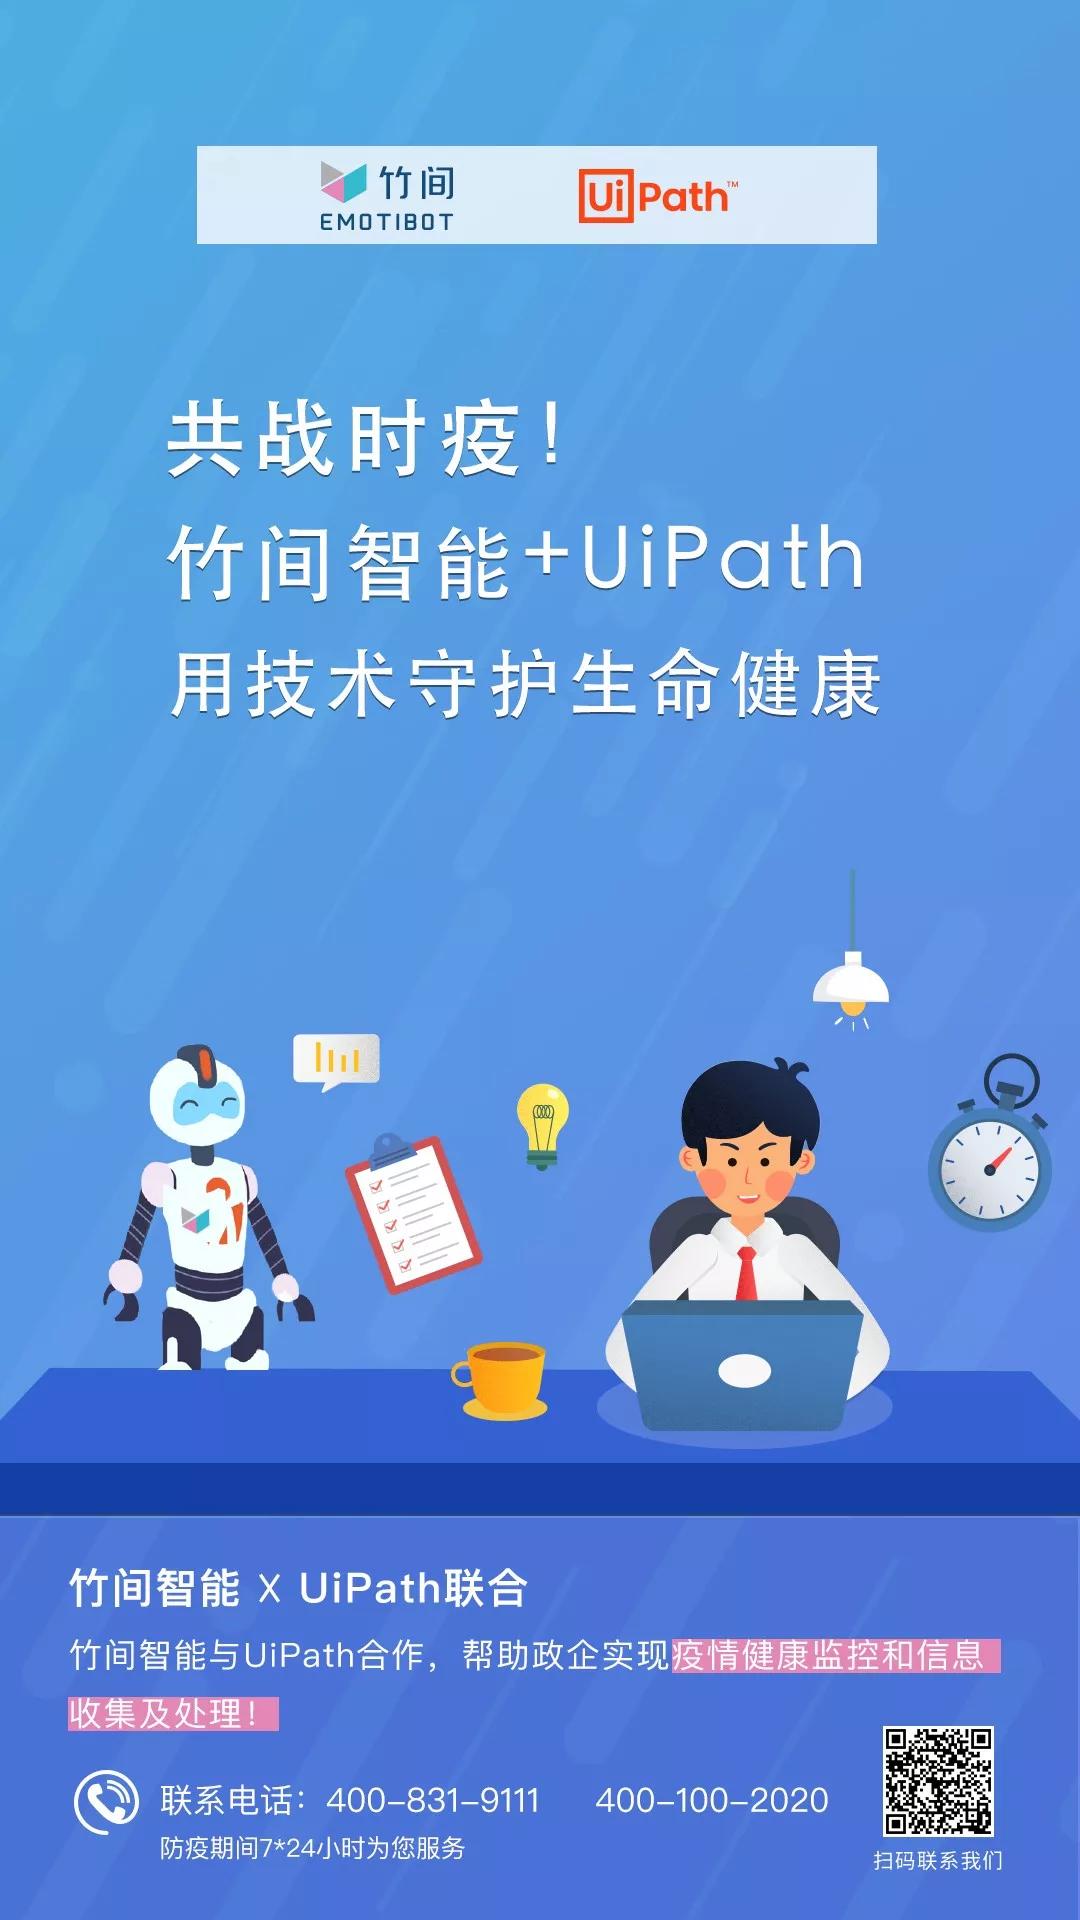 WeChatWorkScreenshot_0b1586c3-1885-4a55-b196-a625501be6ff.png